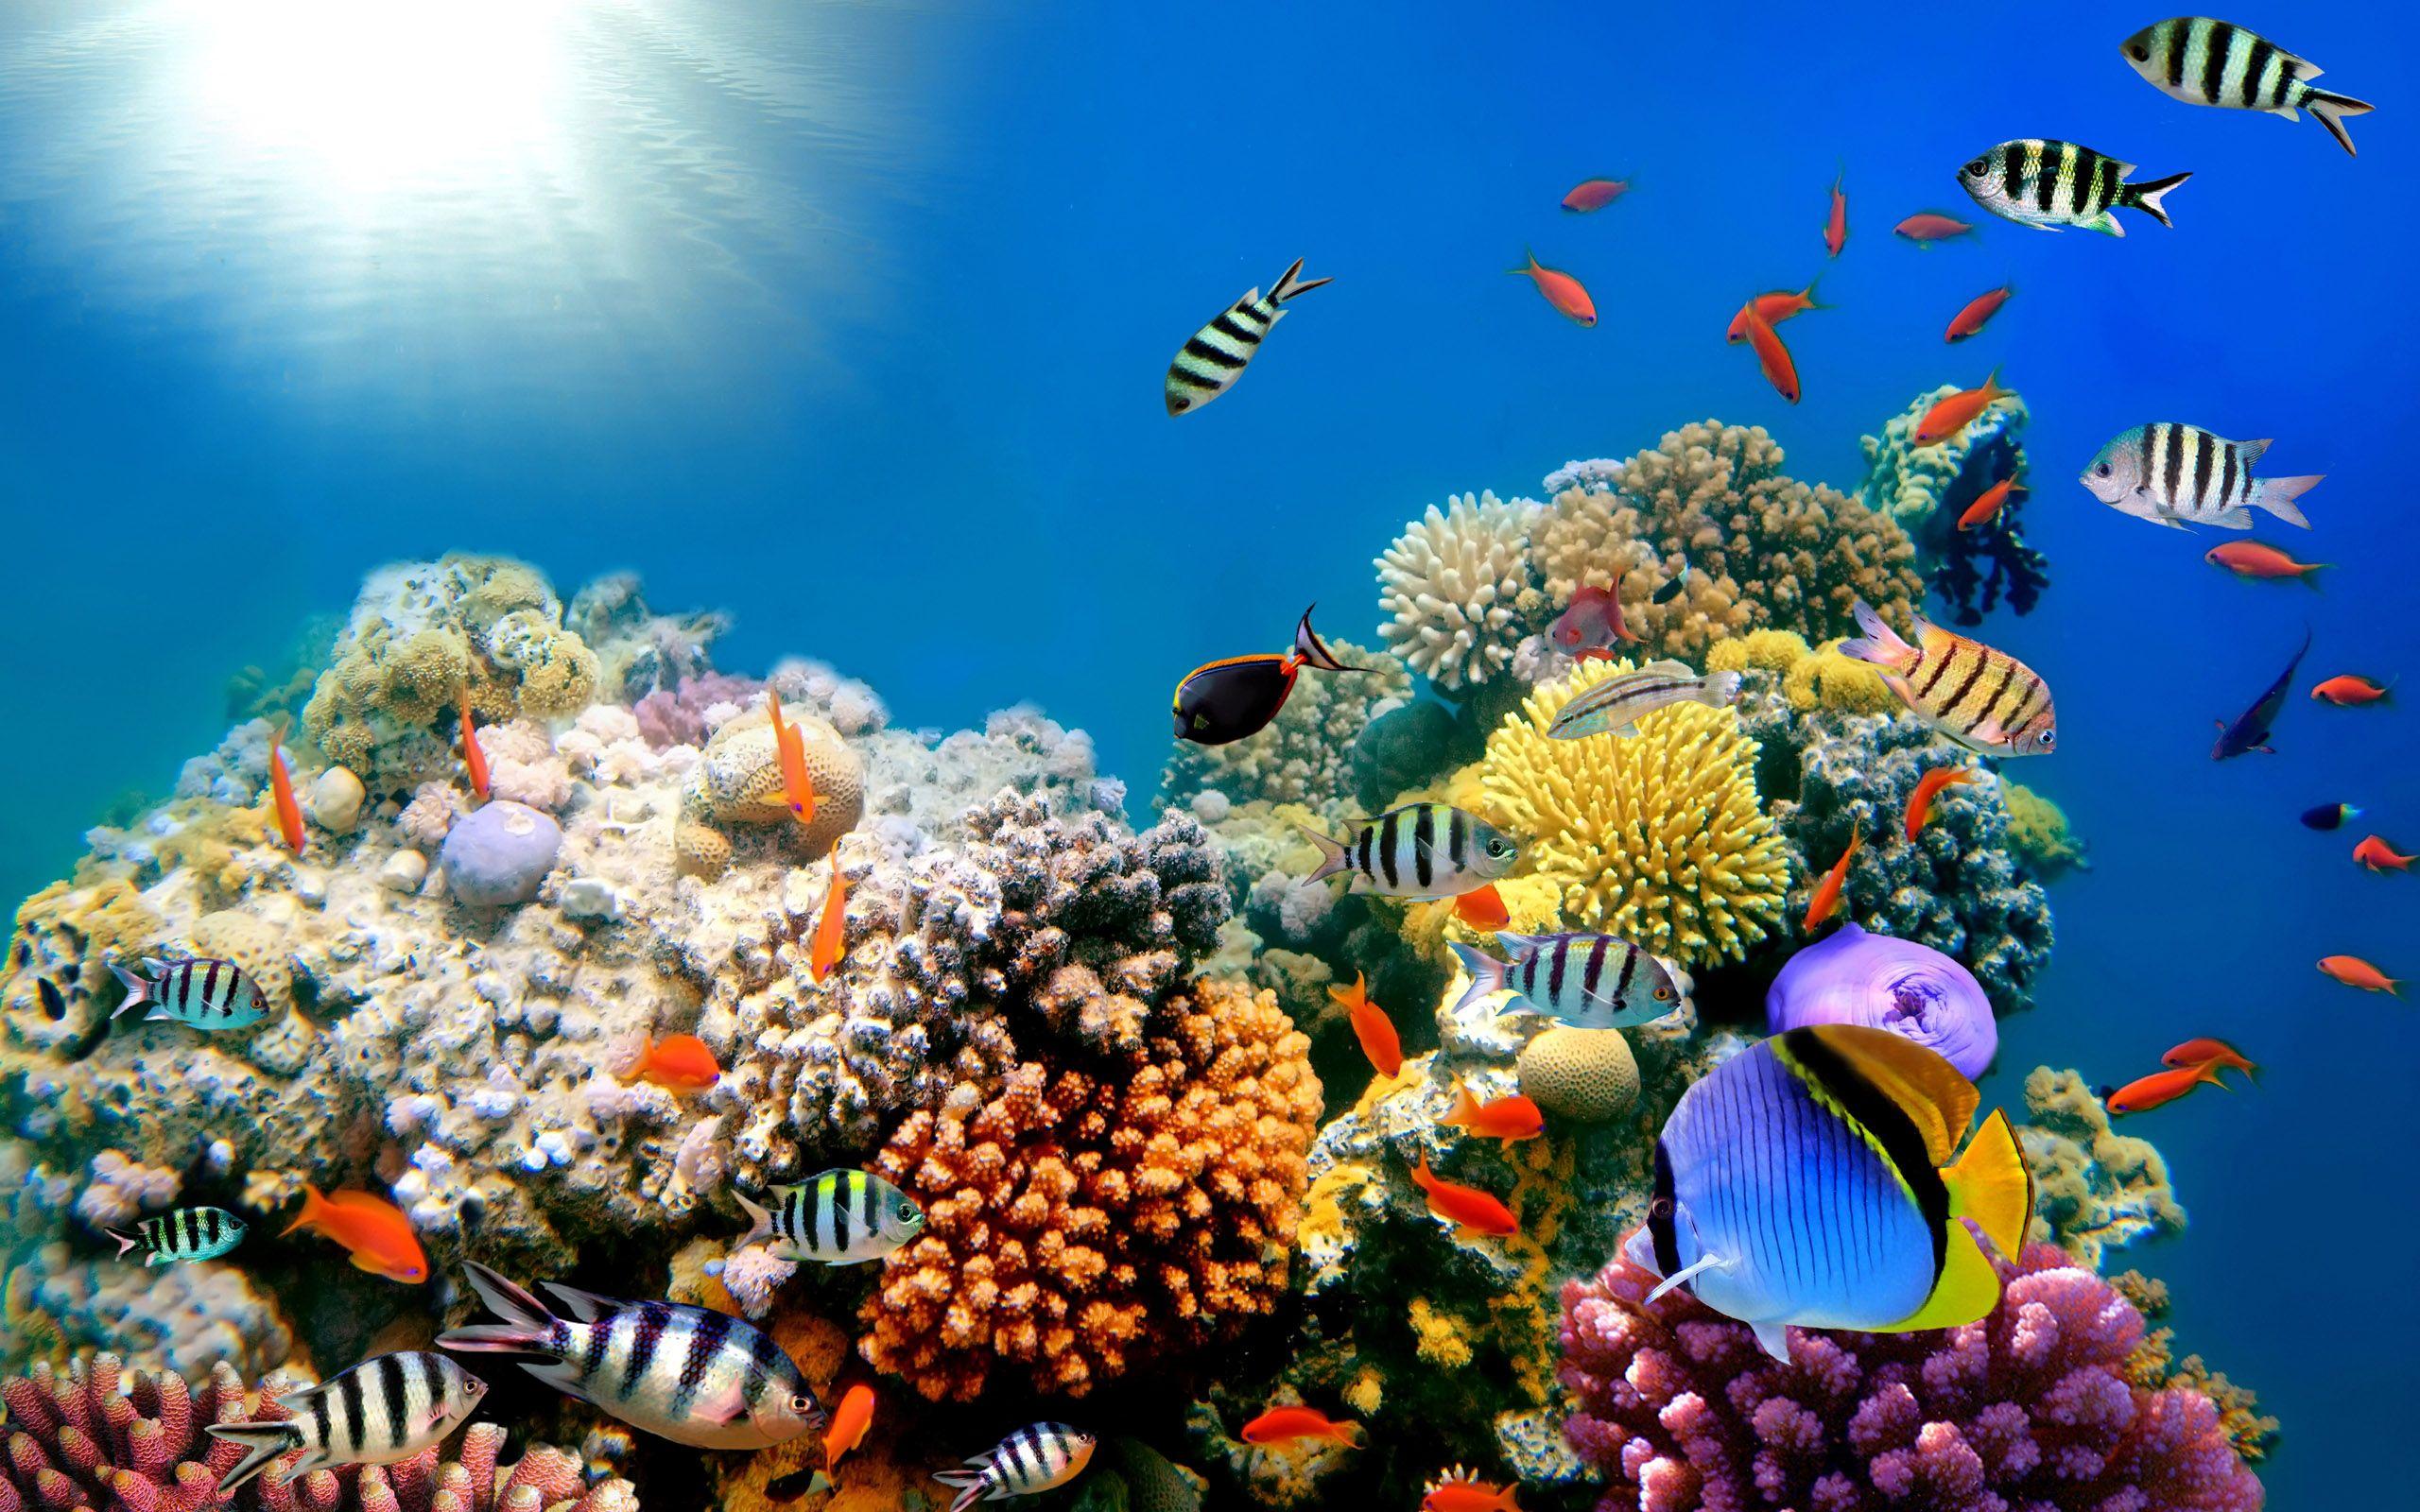 Beautiful coral reef wallpapers, coral reef desktop backgrounds hd